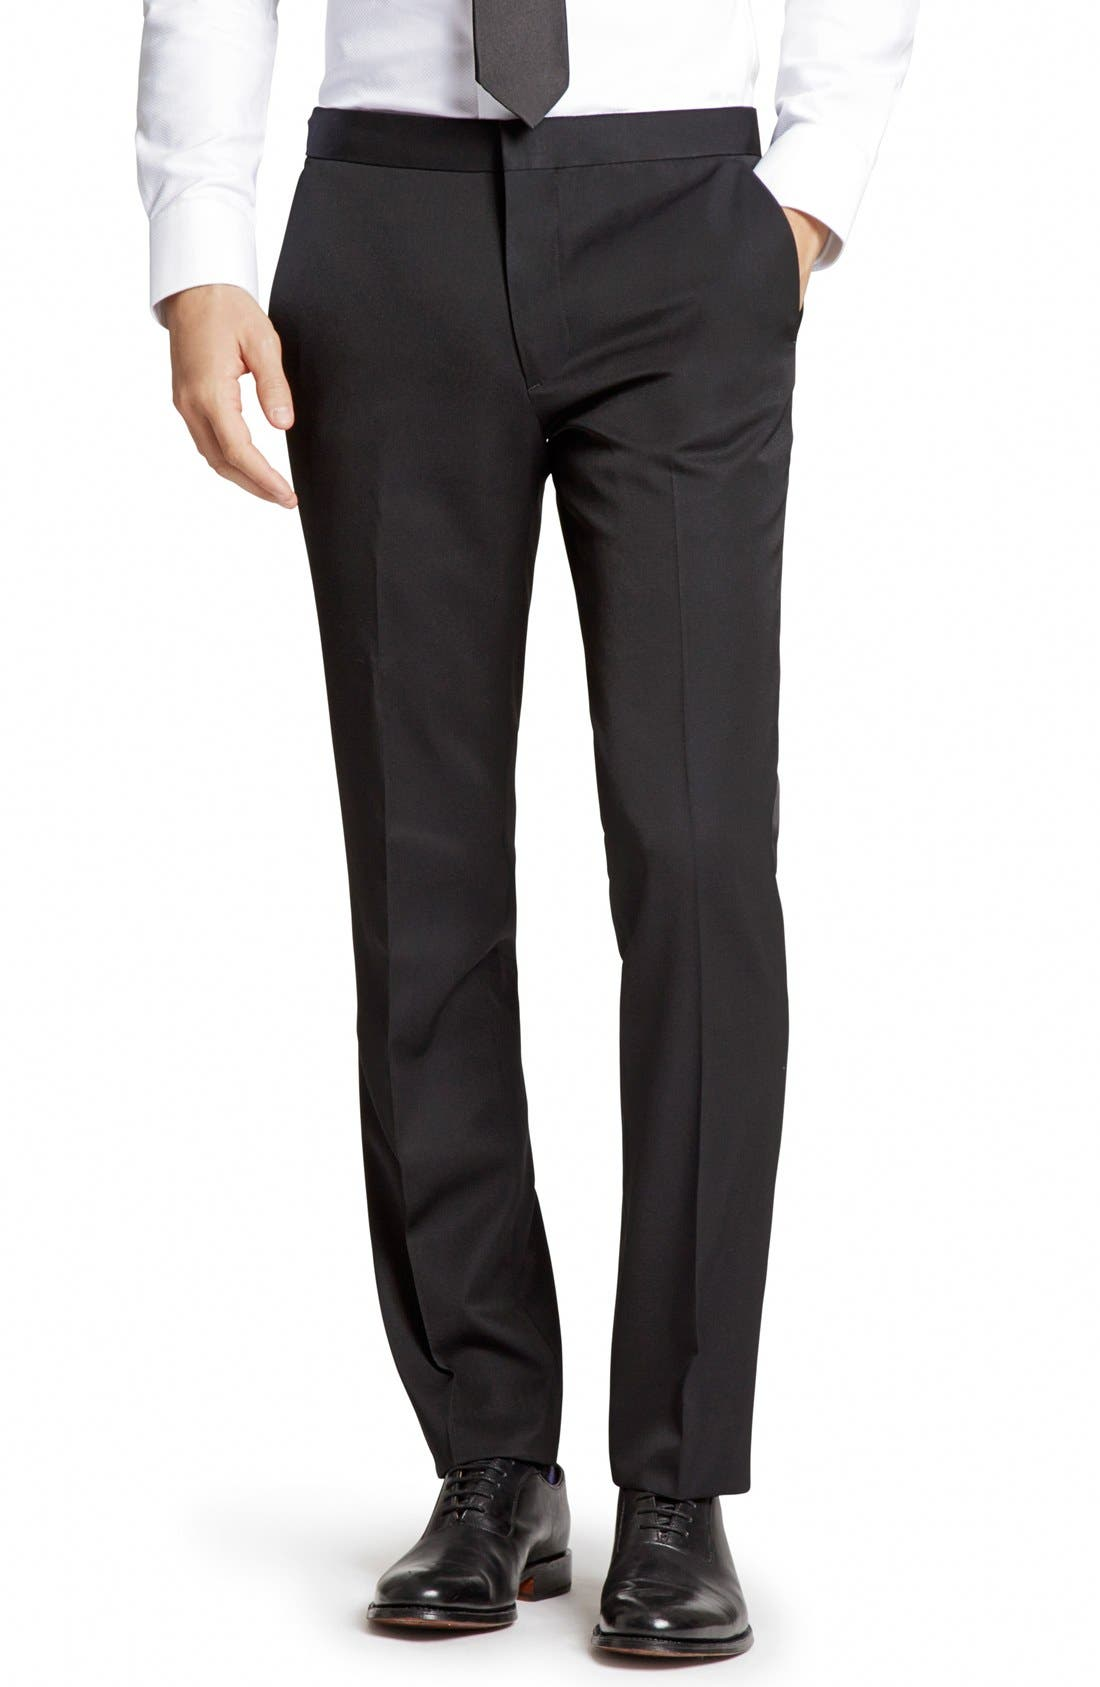 Alternate Image 1 Selected - Bonobos Flat Front Wool Tuxedo Trousers